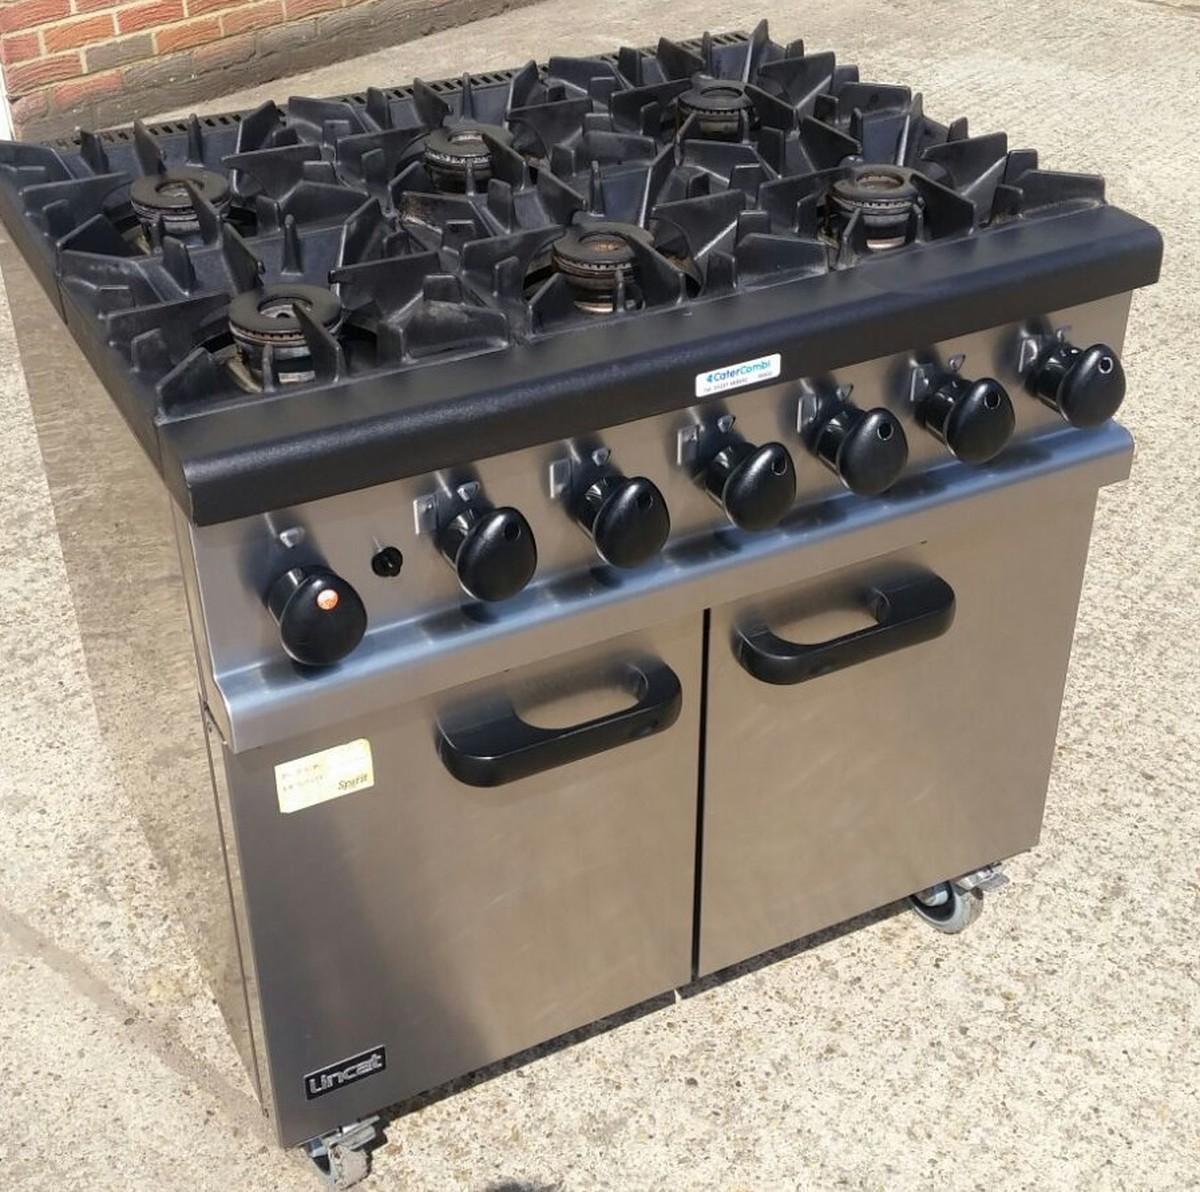 Catering Equipment Rentals 6 Burner Ovens Lincat 6